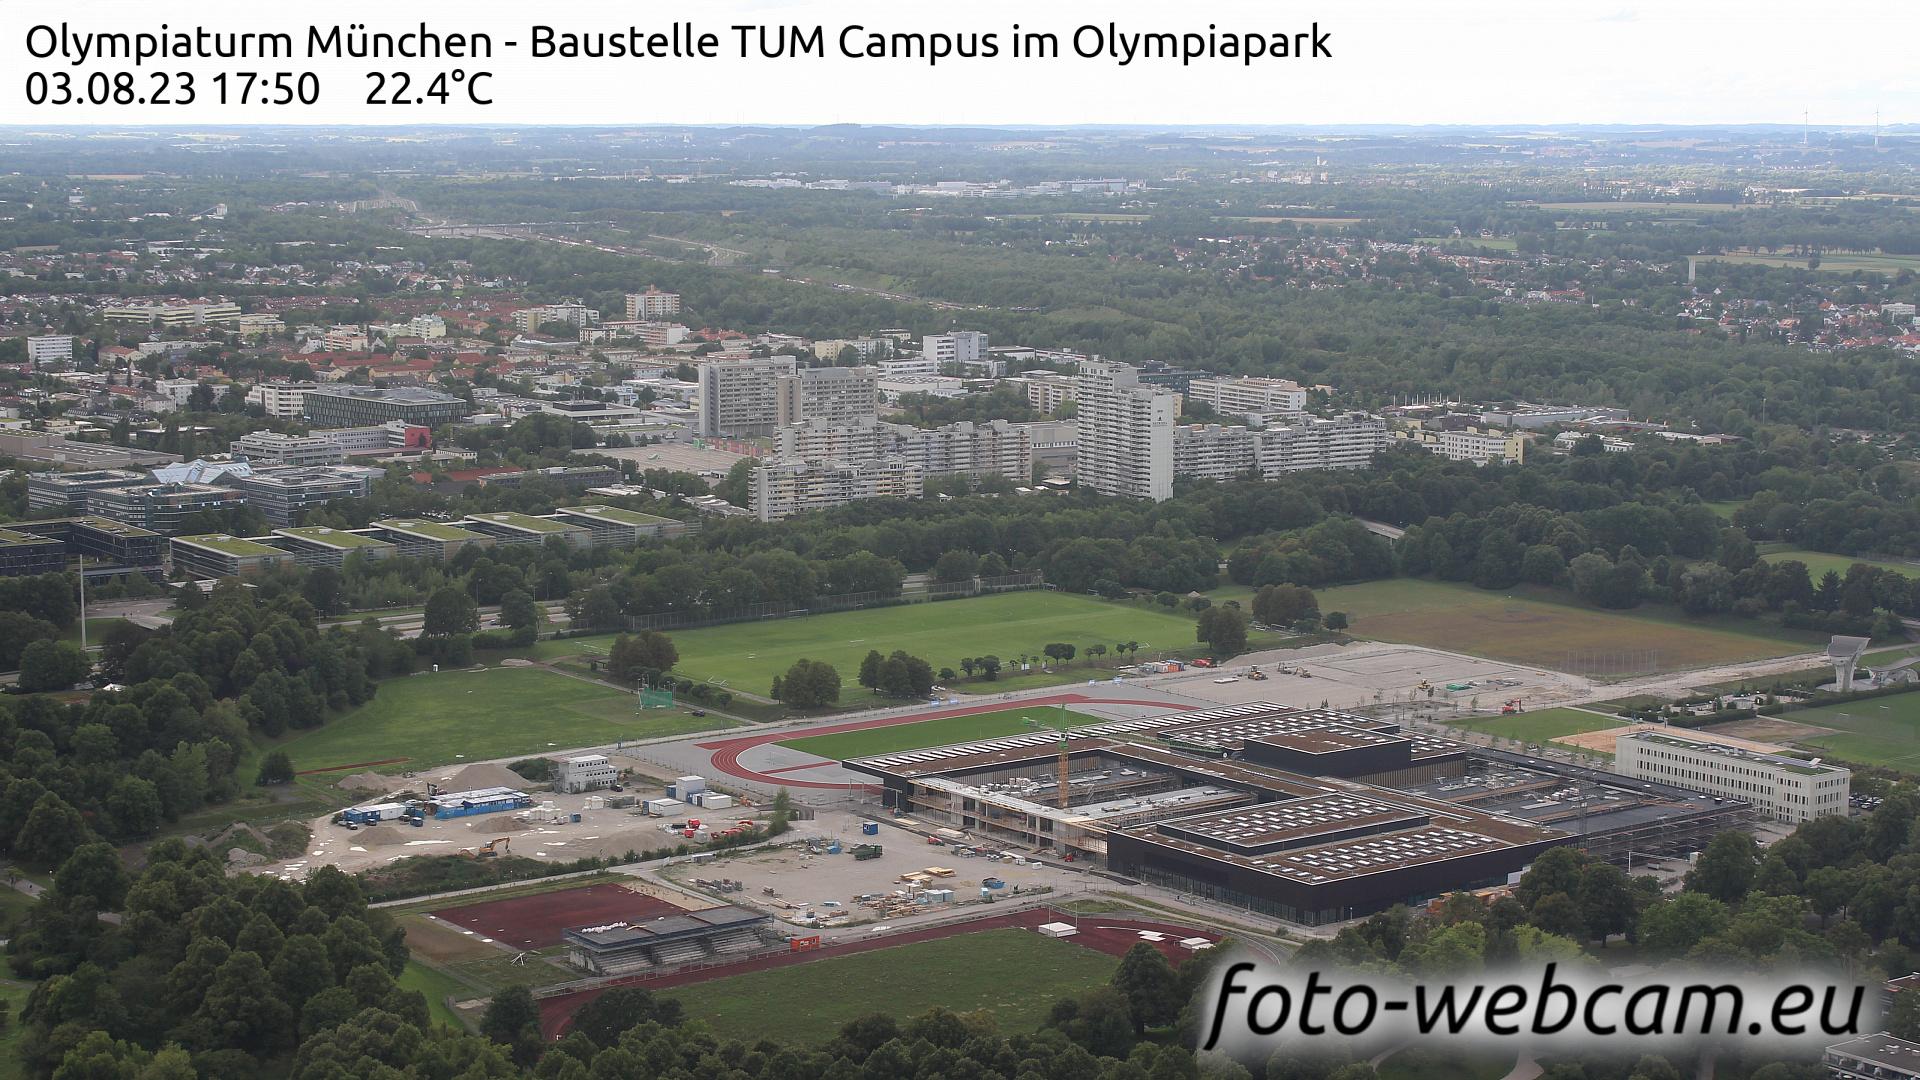 Munich Tue. 17:30